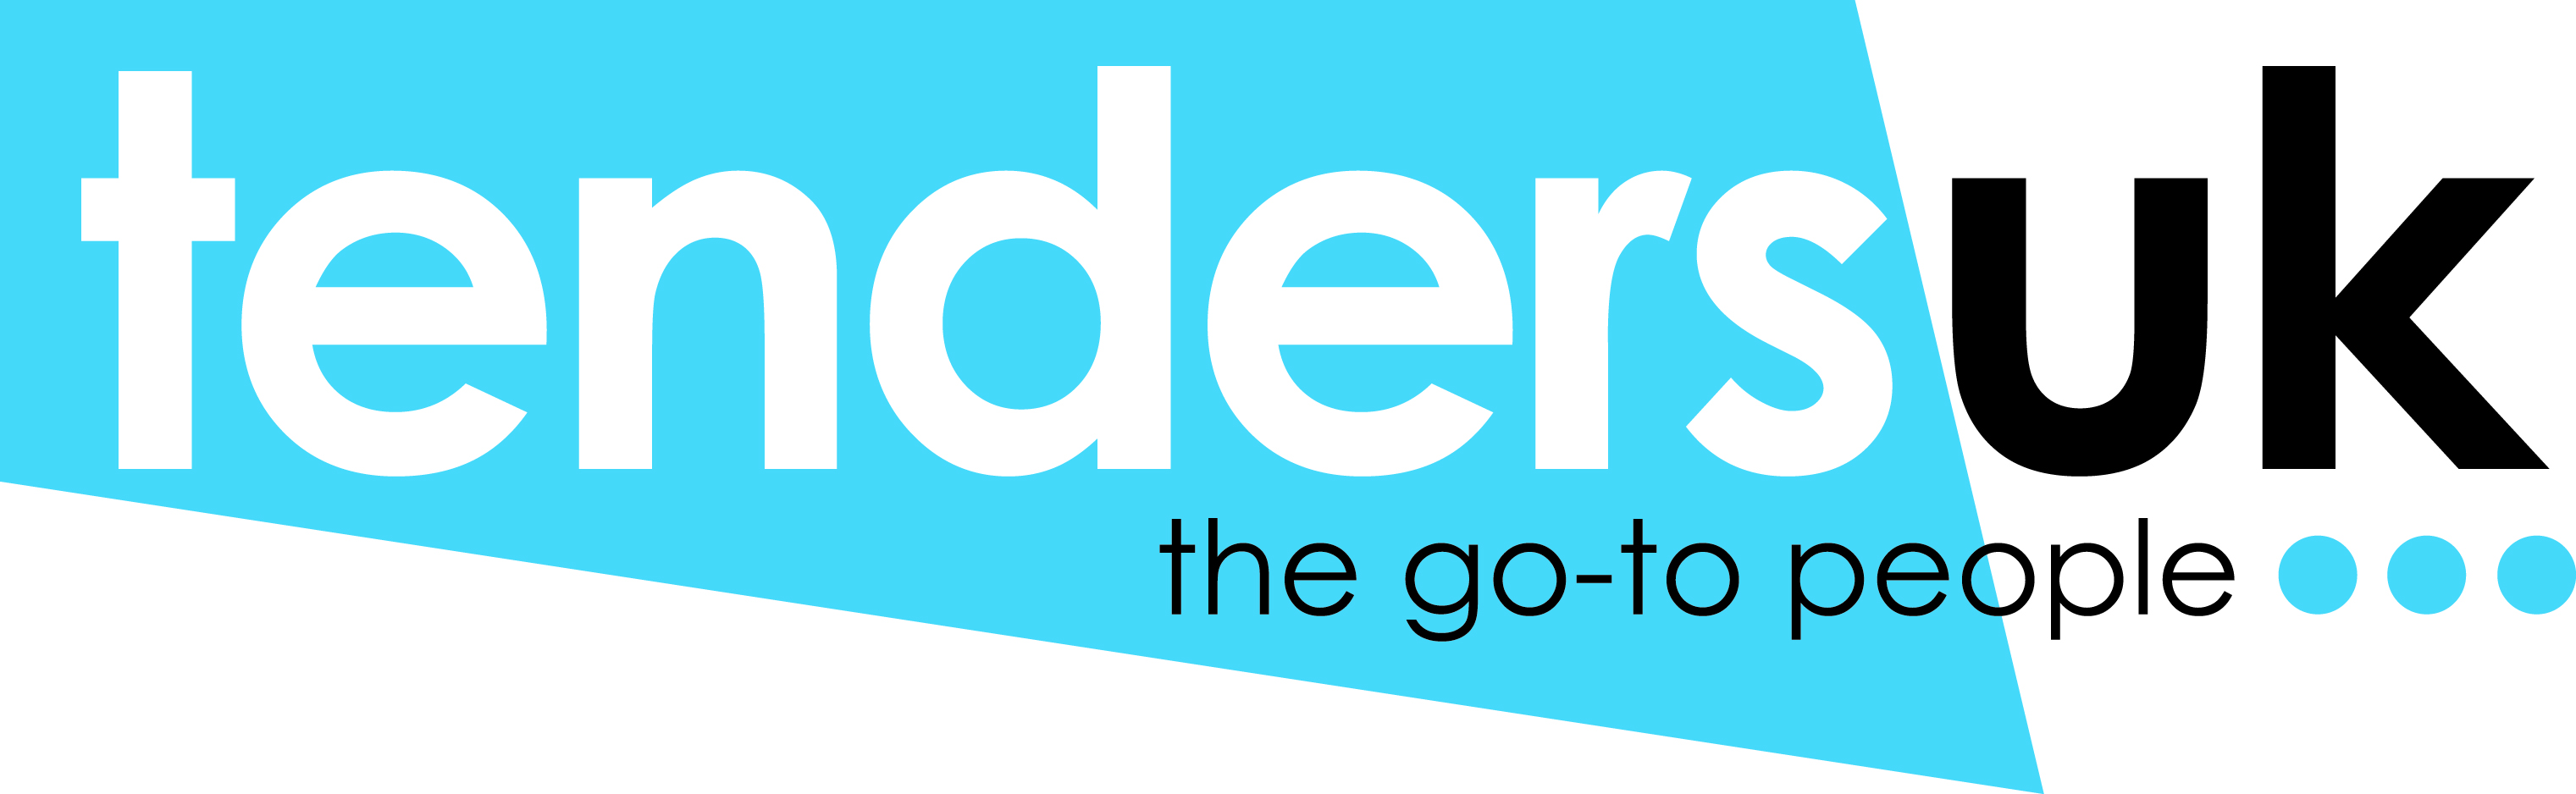 Tenders-UK - The UK's No 1 Bid Writing Company